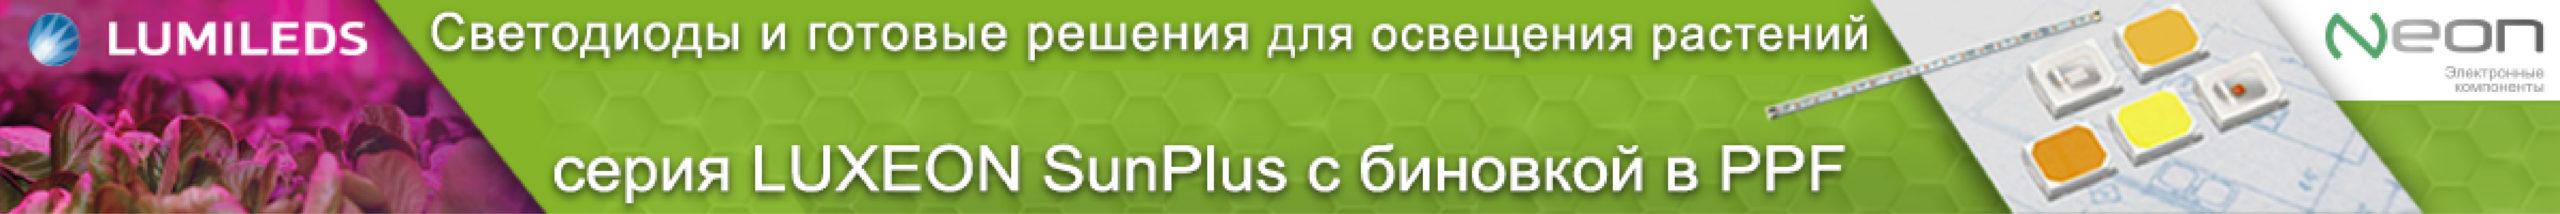 НЕОН-ЭК